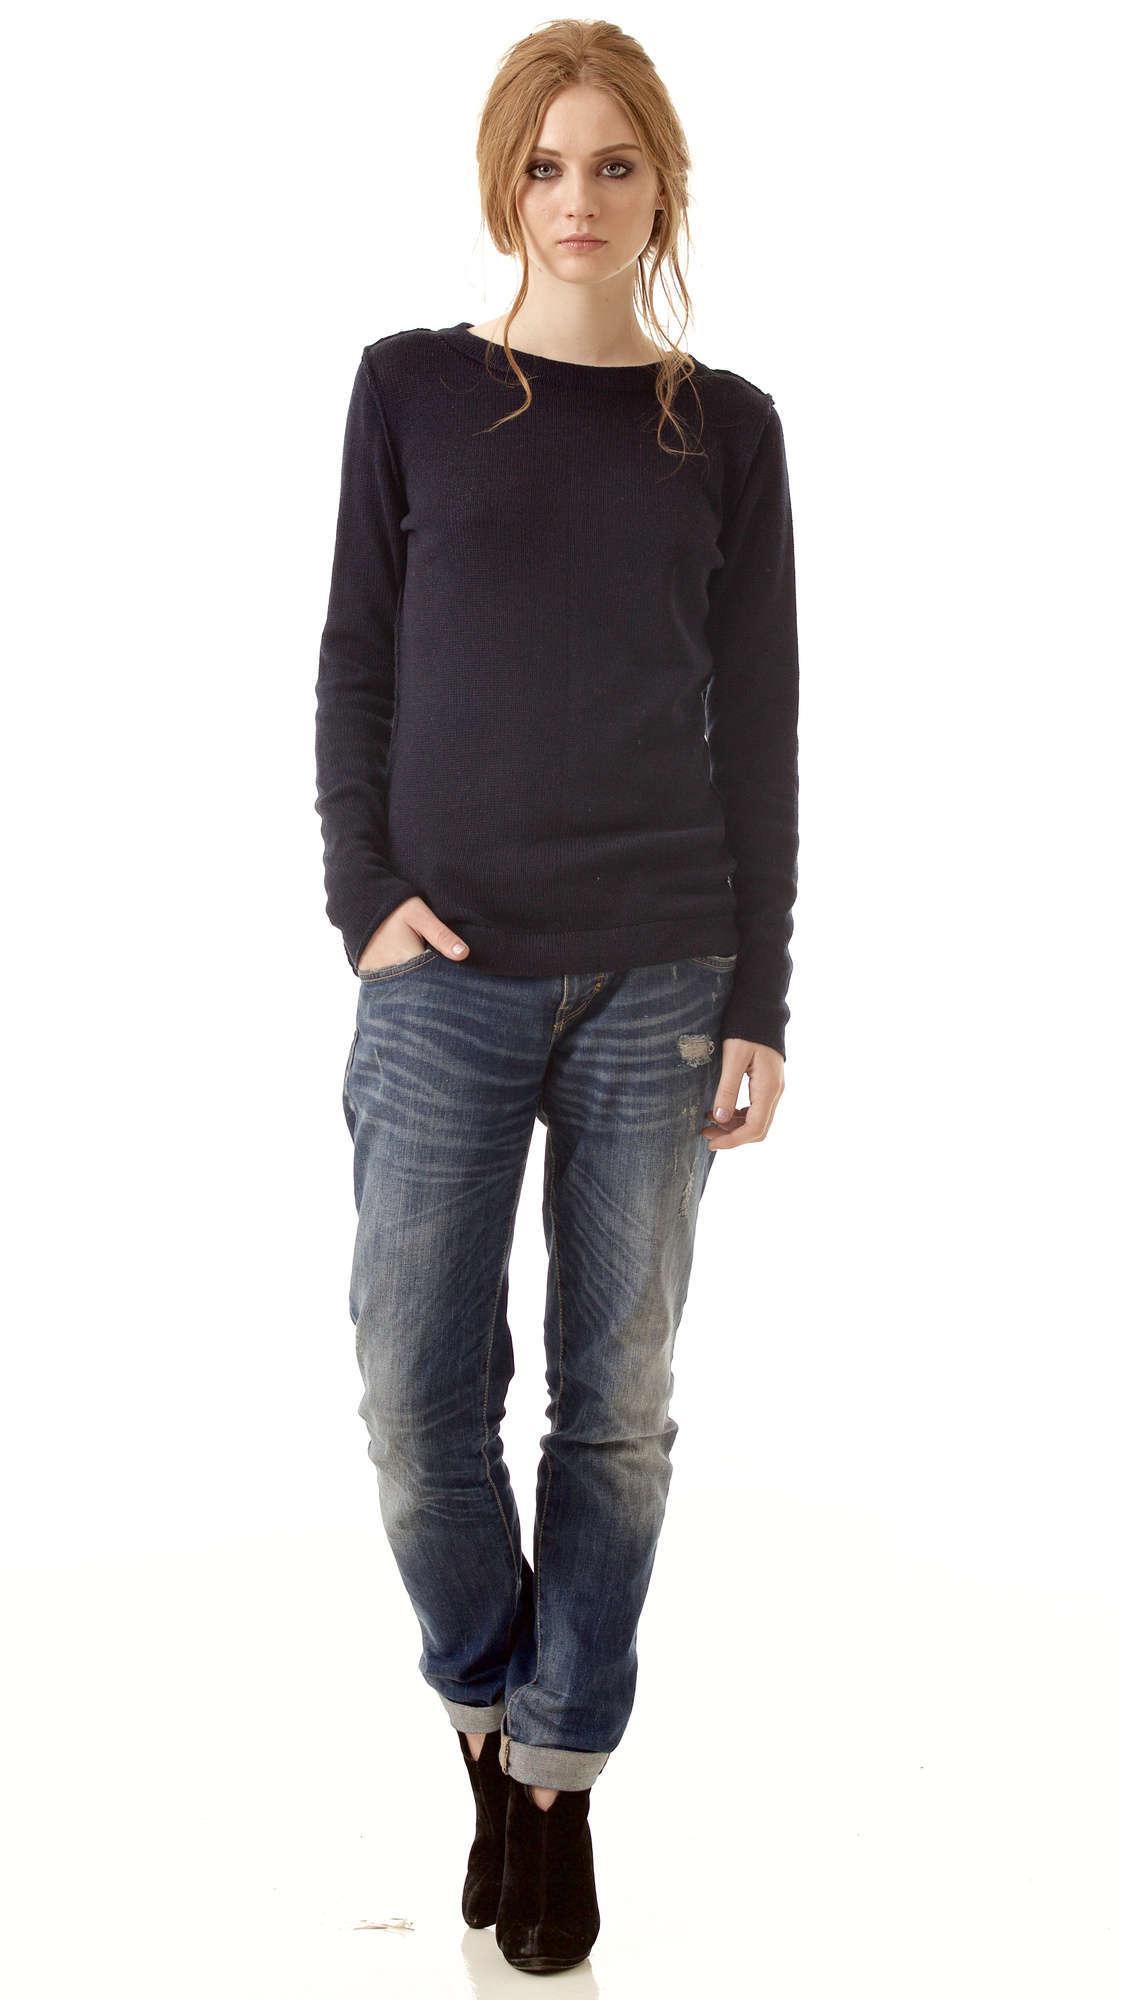 Black cashmere womens sweater damen pullover ELSA